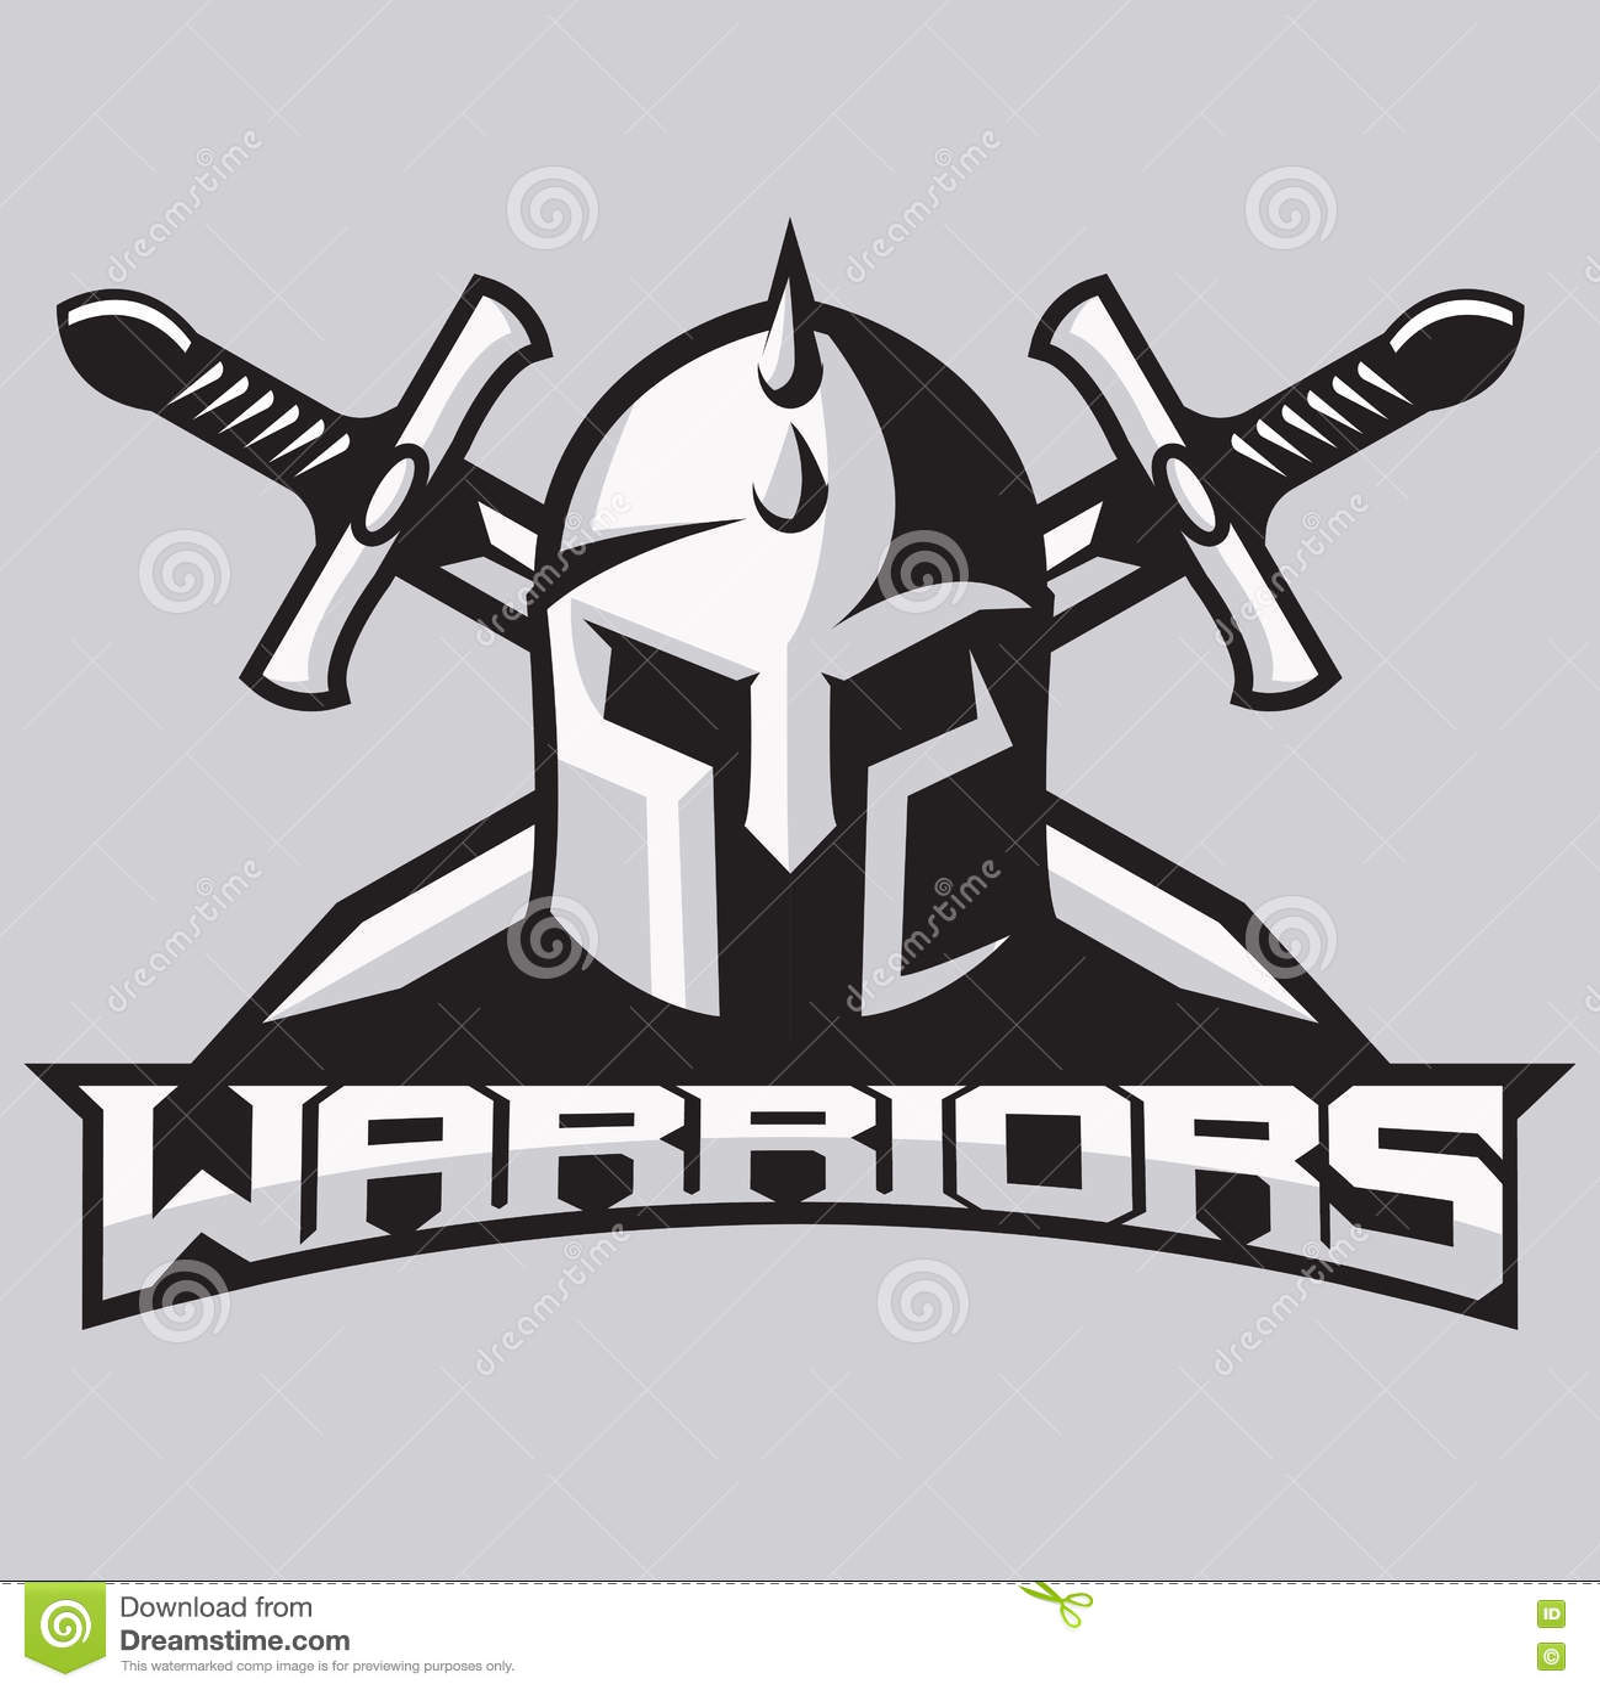 Warrior Mascot For Sport Teams. Helmet With Swords, Logo, Symbol On ...